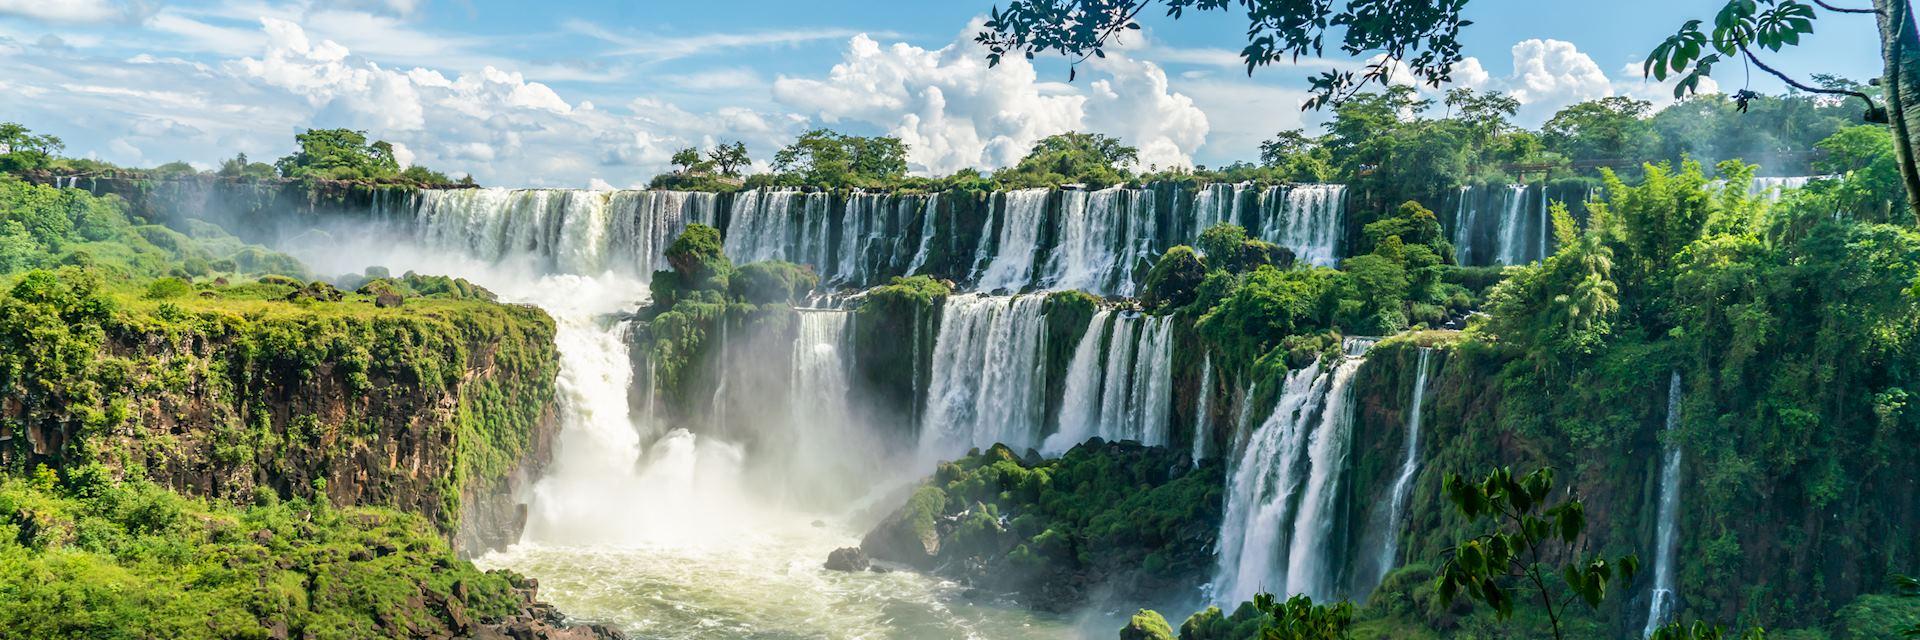 Iguazú Falls, Argentinian National Park